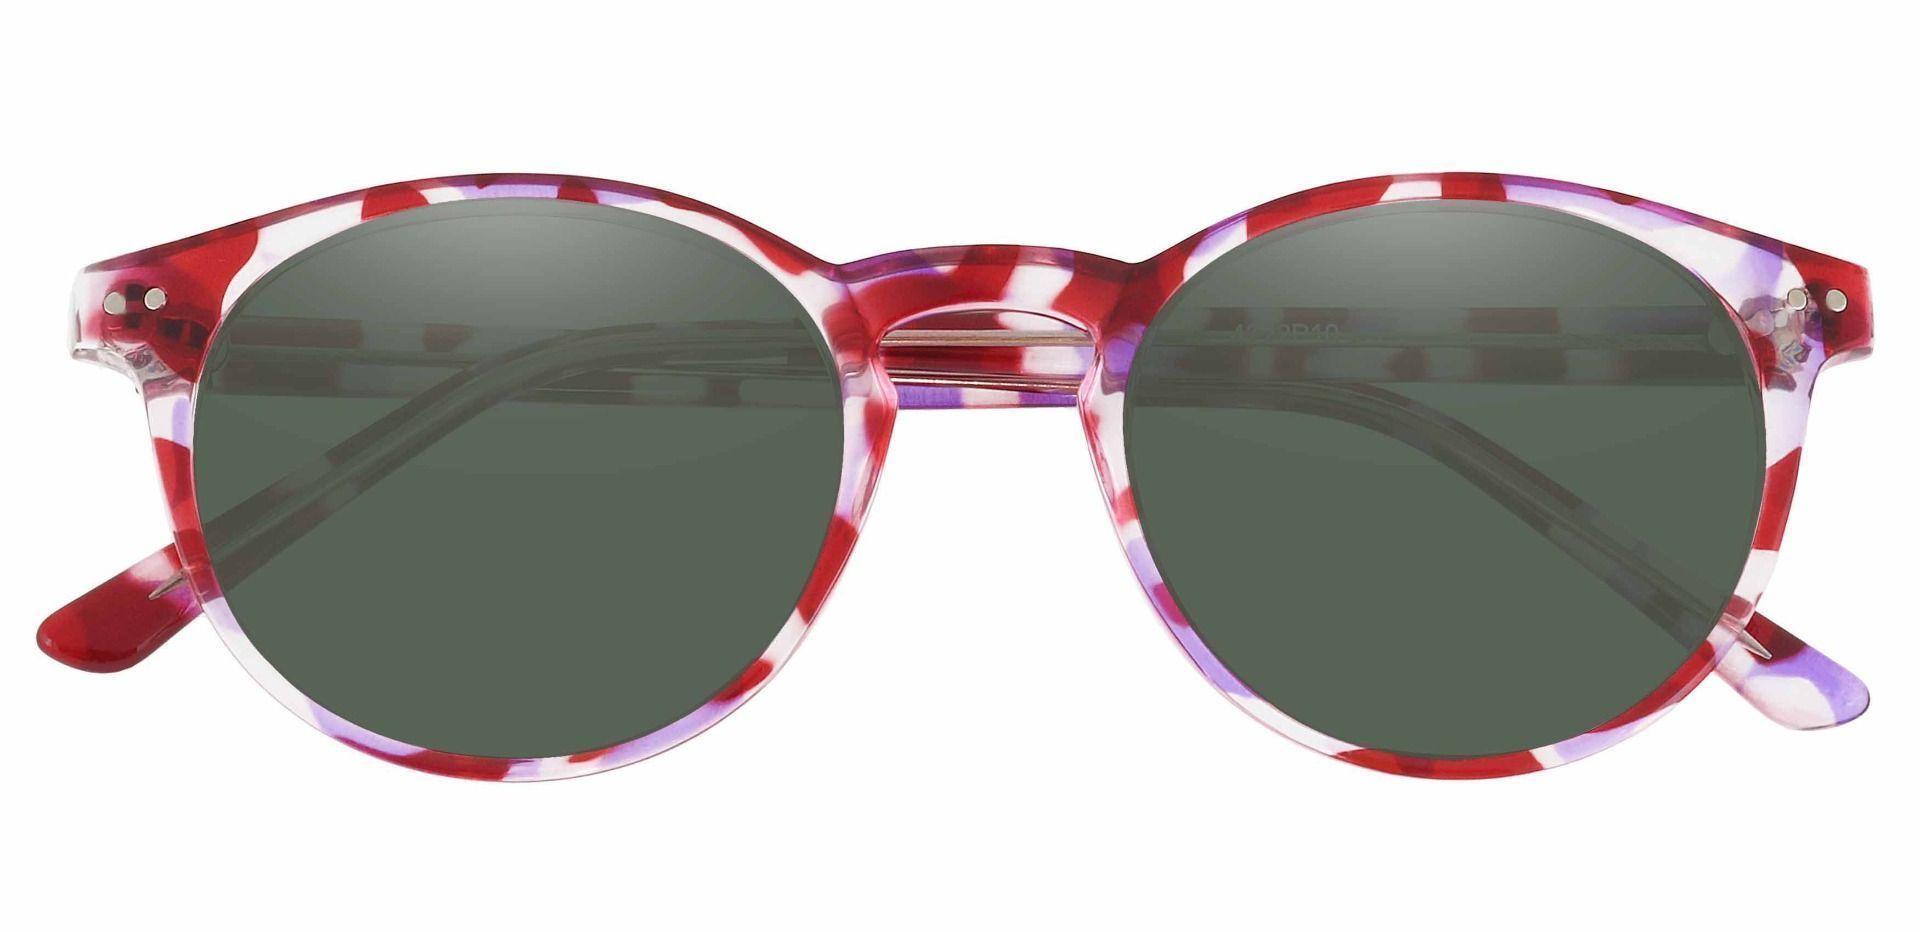 Harmony Oval Prescription Sunglasses - Purple Frame With Green Lenses